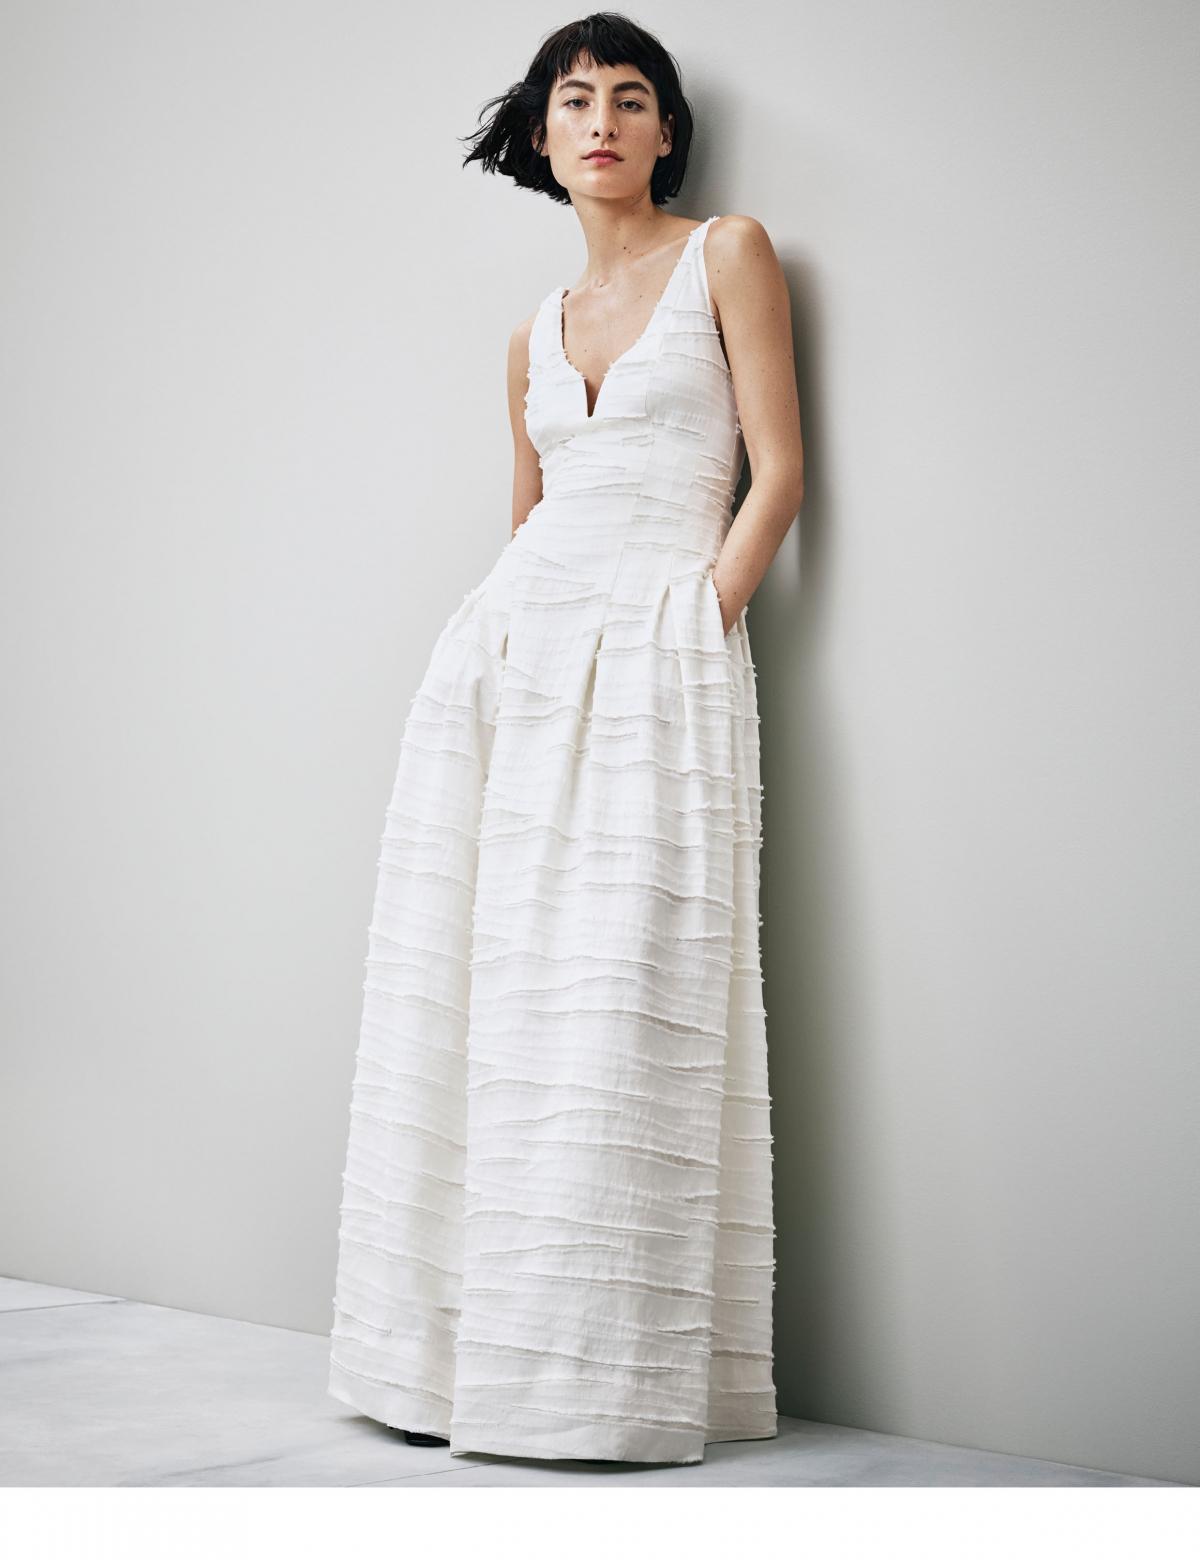 H&M conscious collection bridal